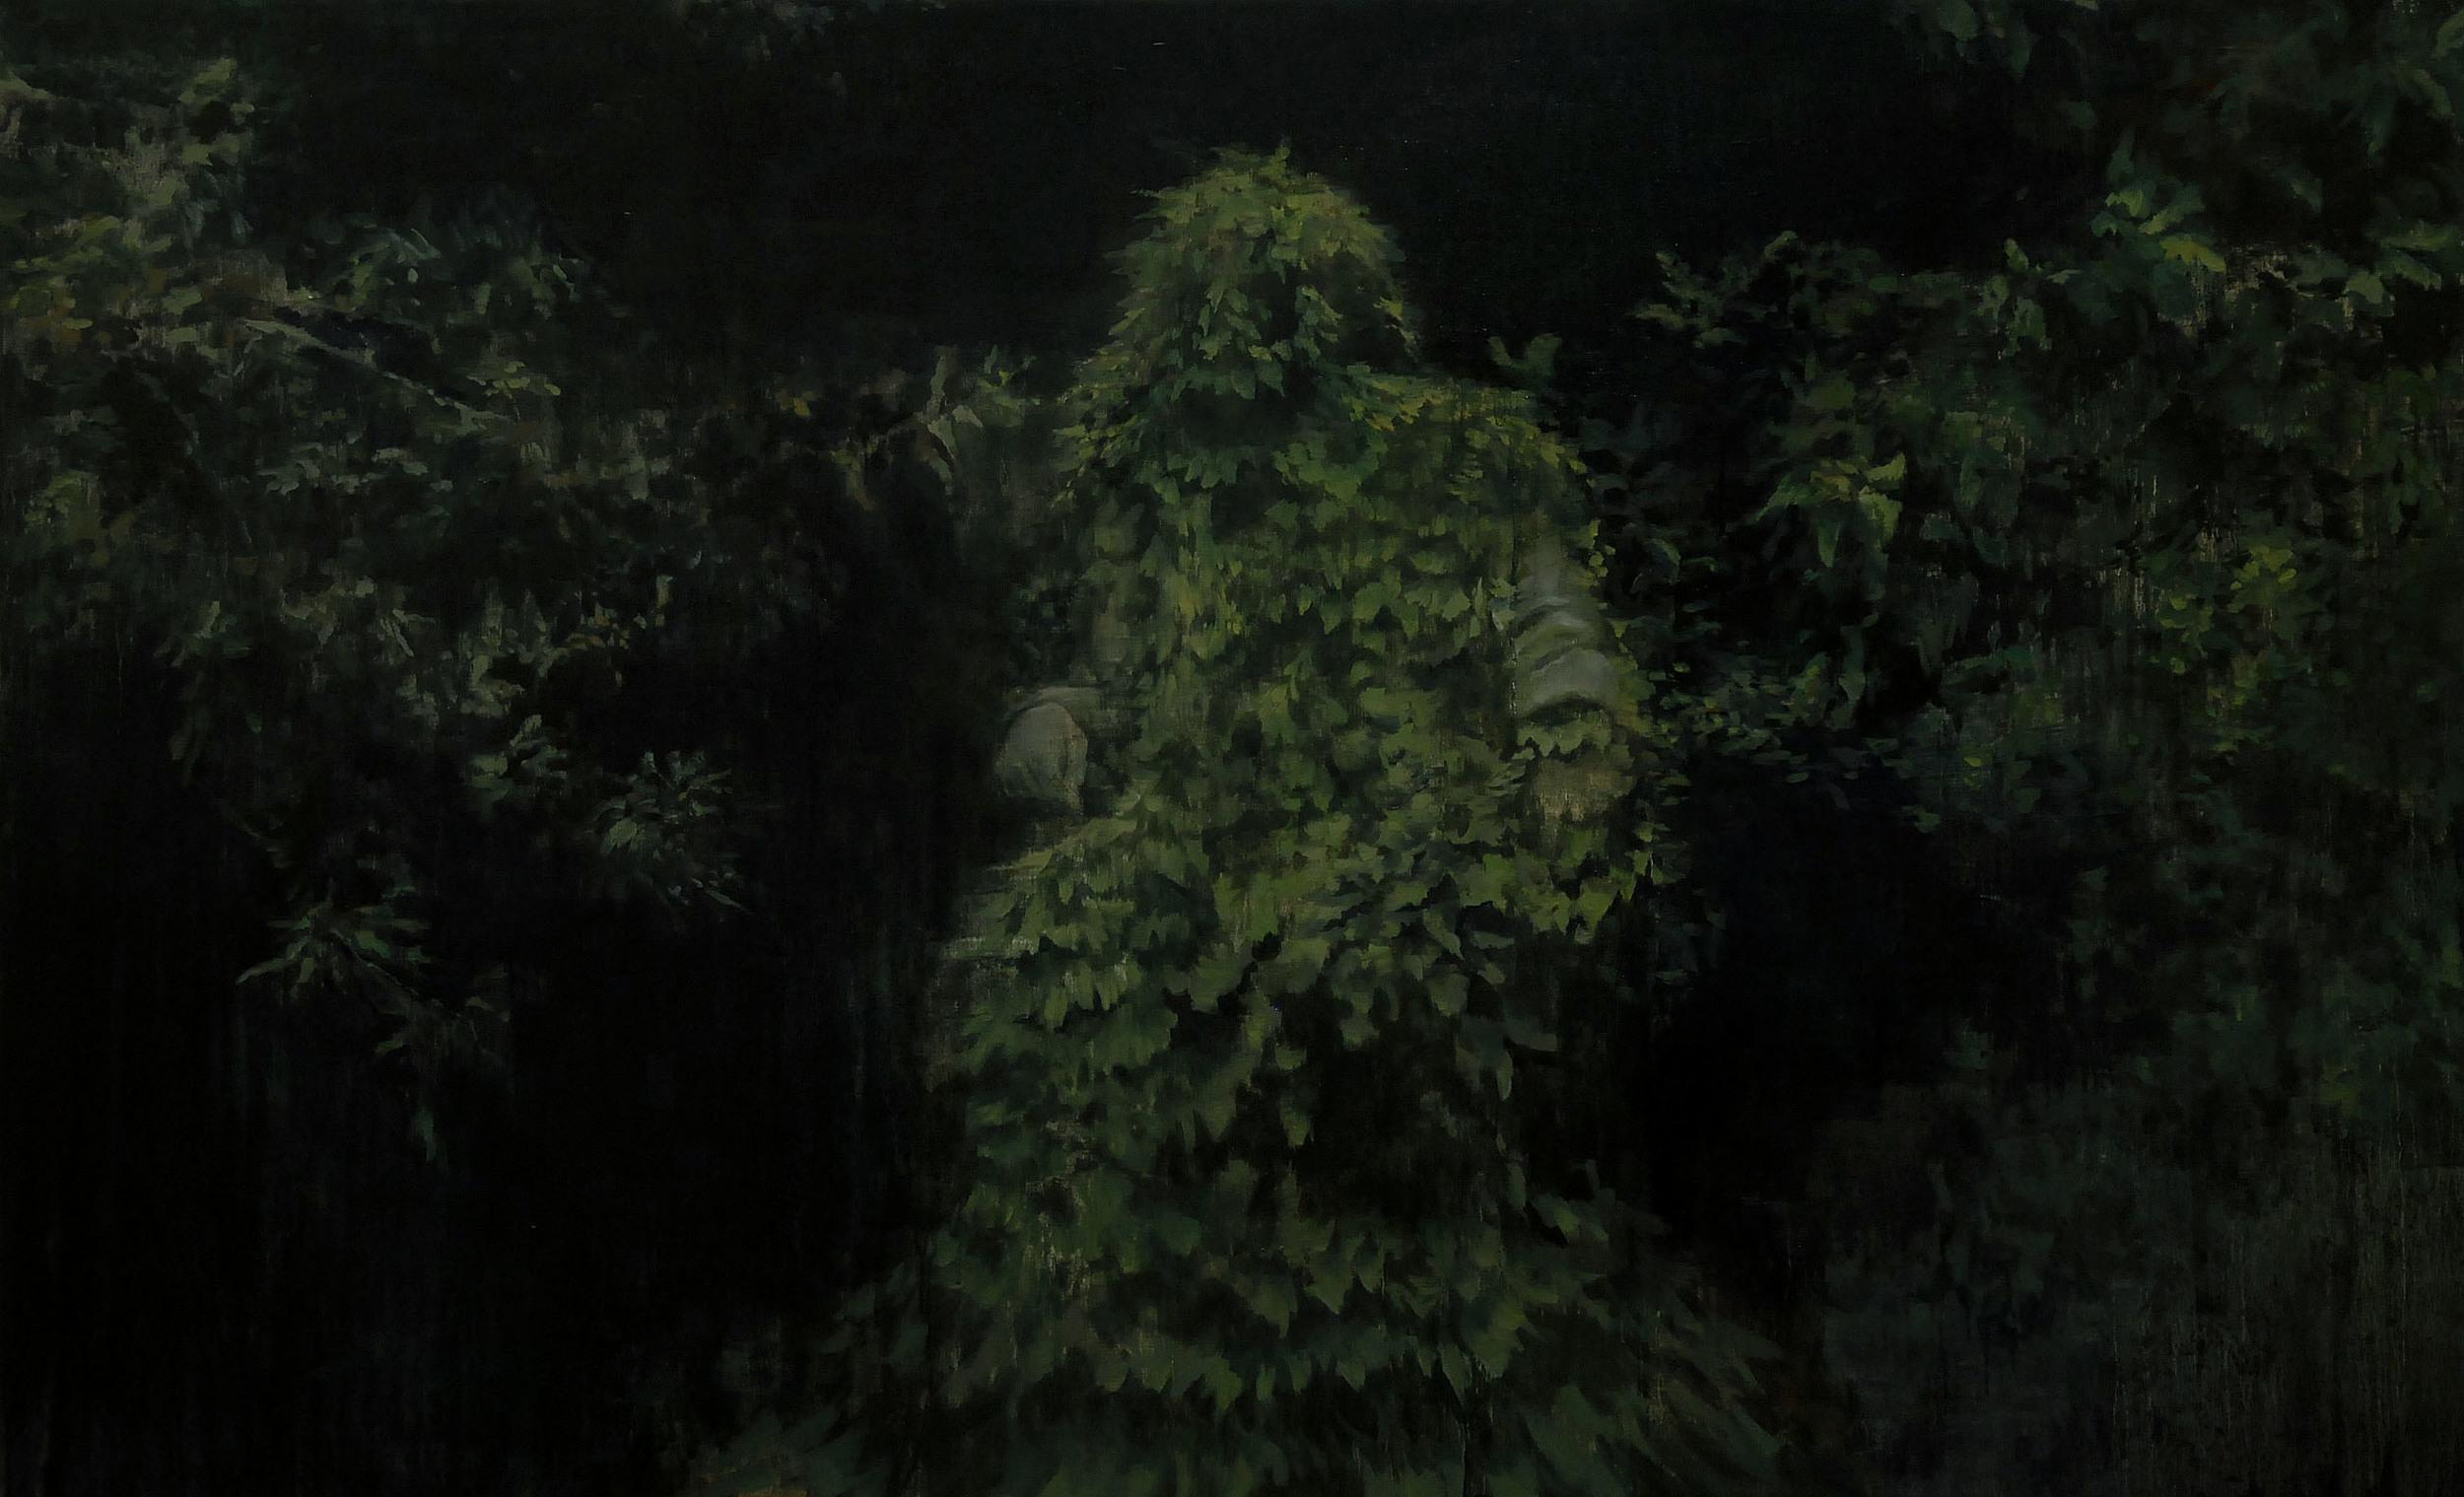 Lu Song 吕松, Overgrowth, 2012, Oil on canvas 布面油画, 210 x 130 cm